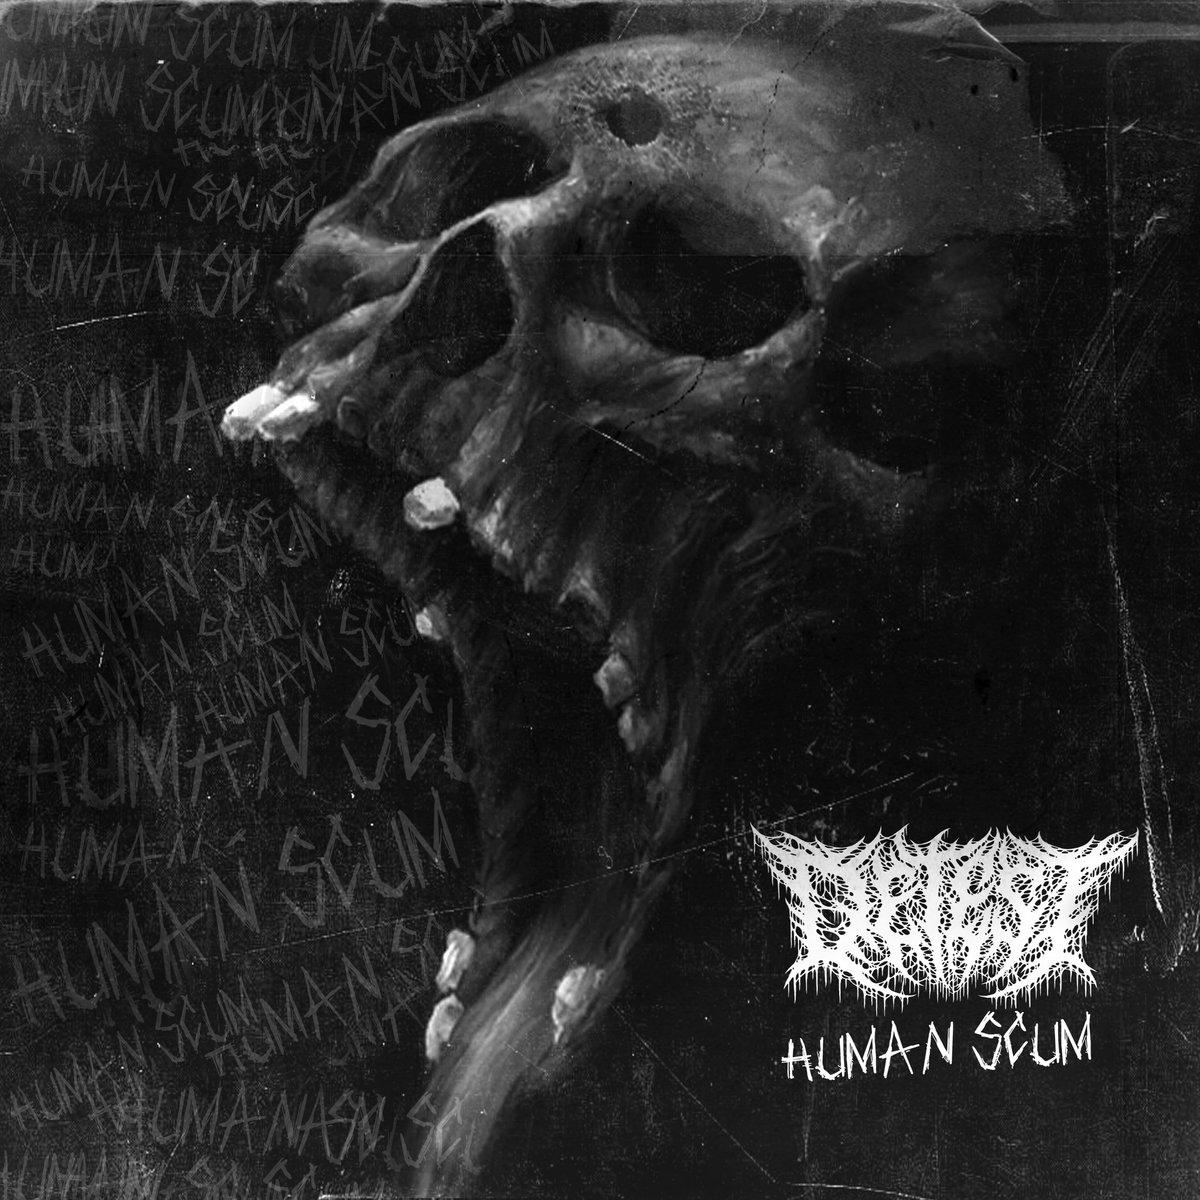 Detest - Human Scum [EP] (2019)